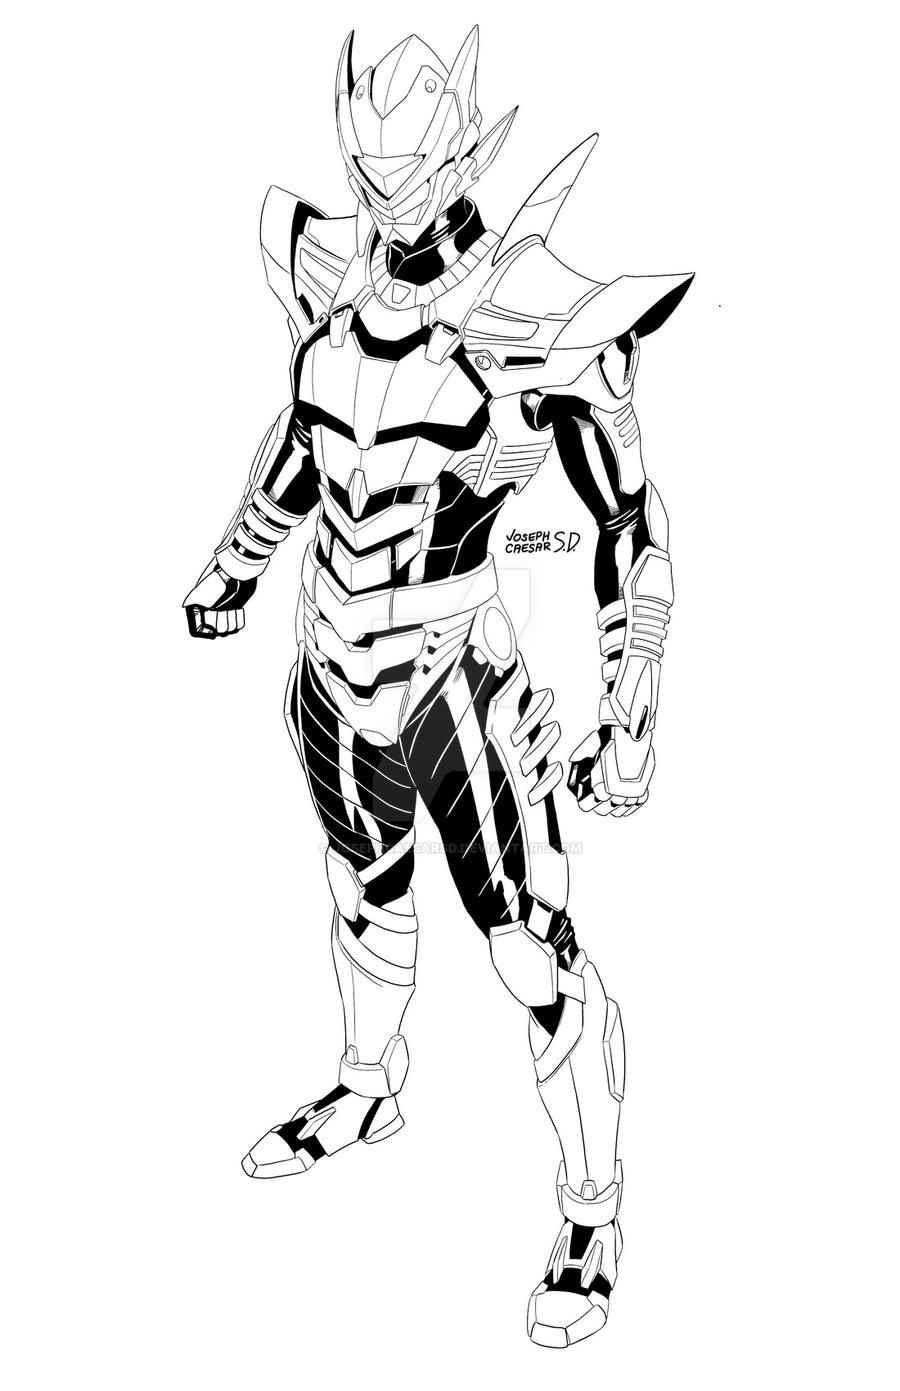 Tech Ninja 02 by josephcaesarsd